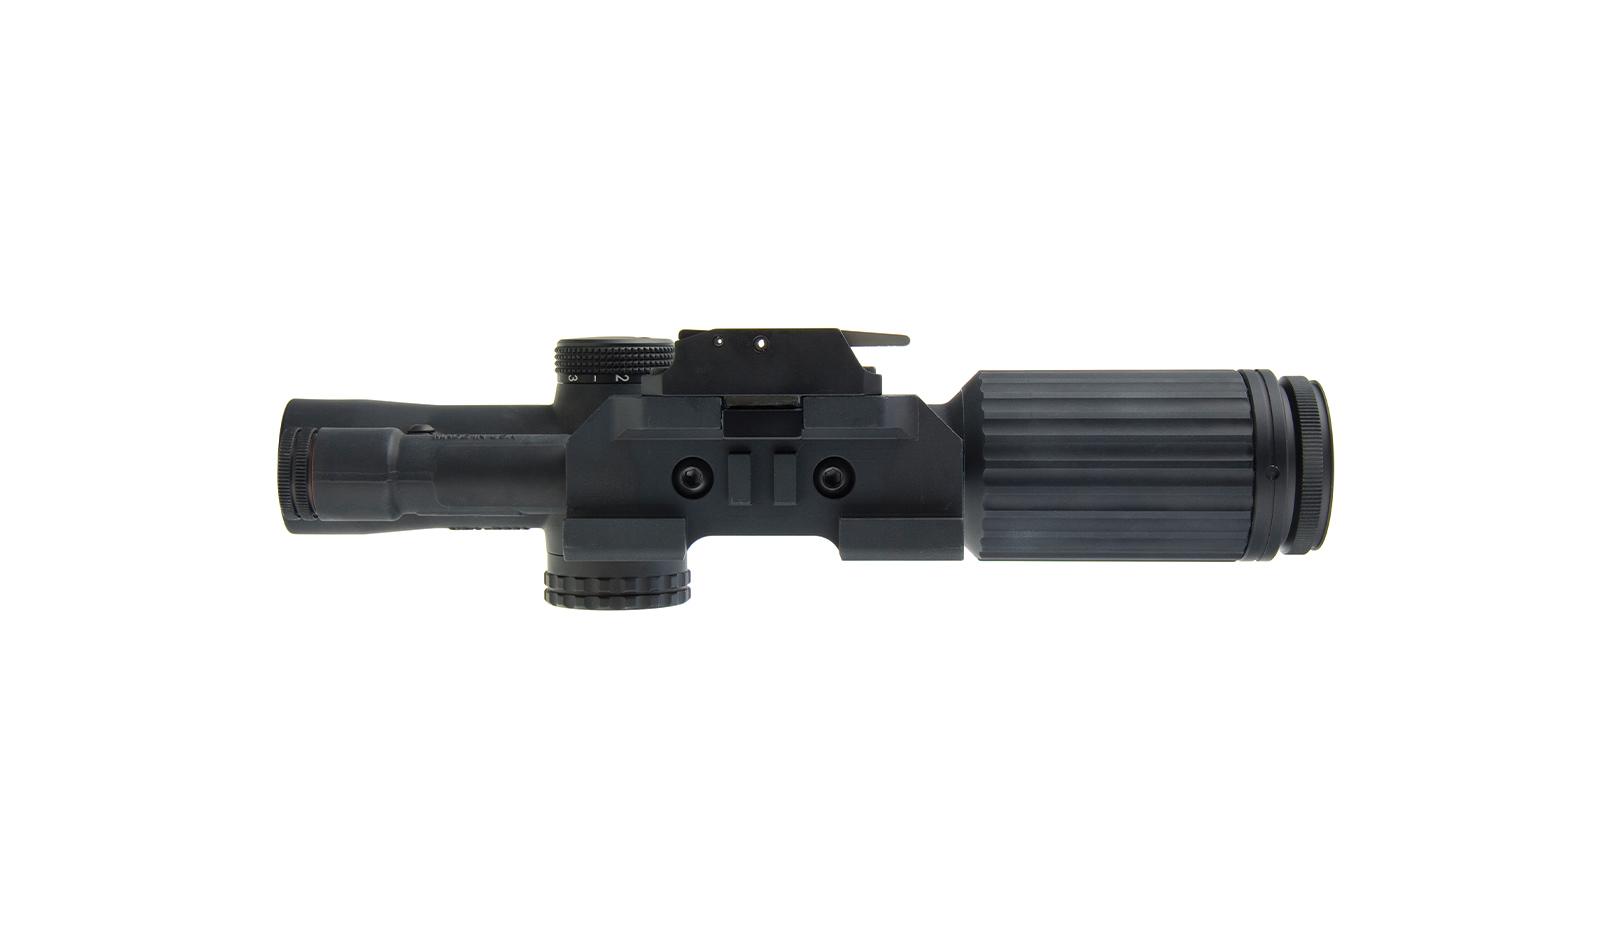 VC16-C-1600049 angle 10